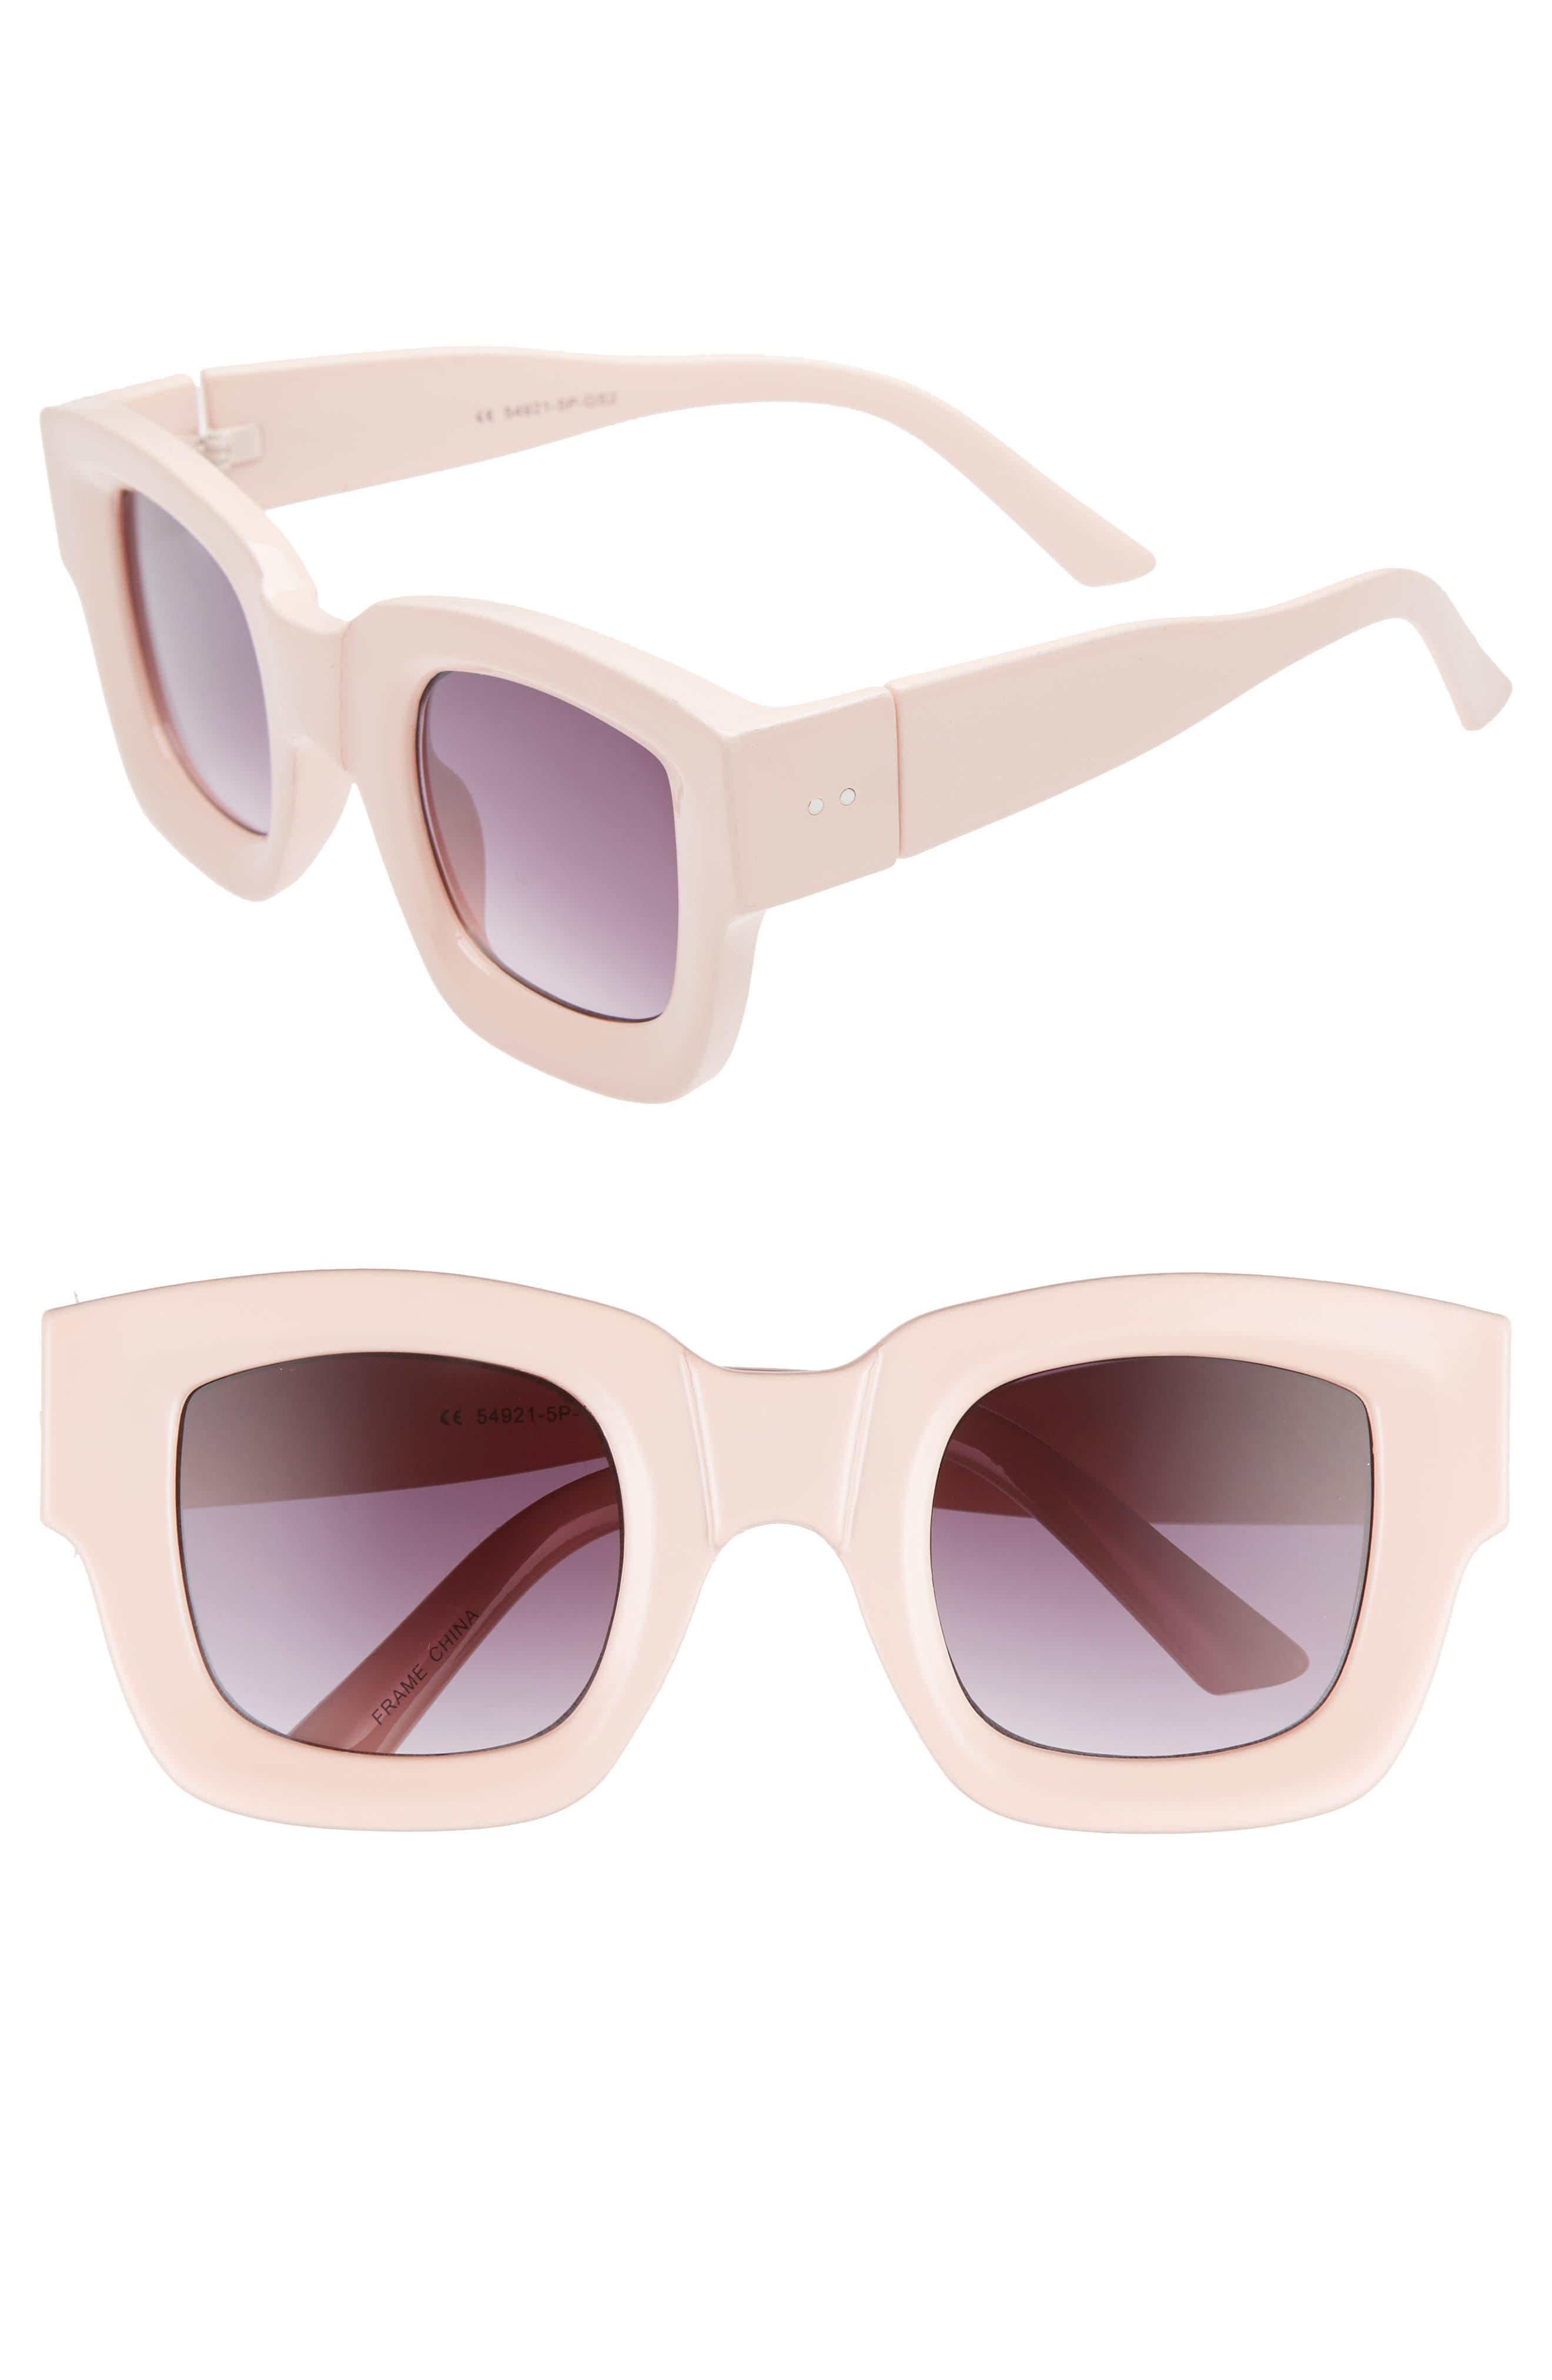 45mm Square Sunglasses,                             Main thumbnail 1, color,                             PALE PINK